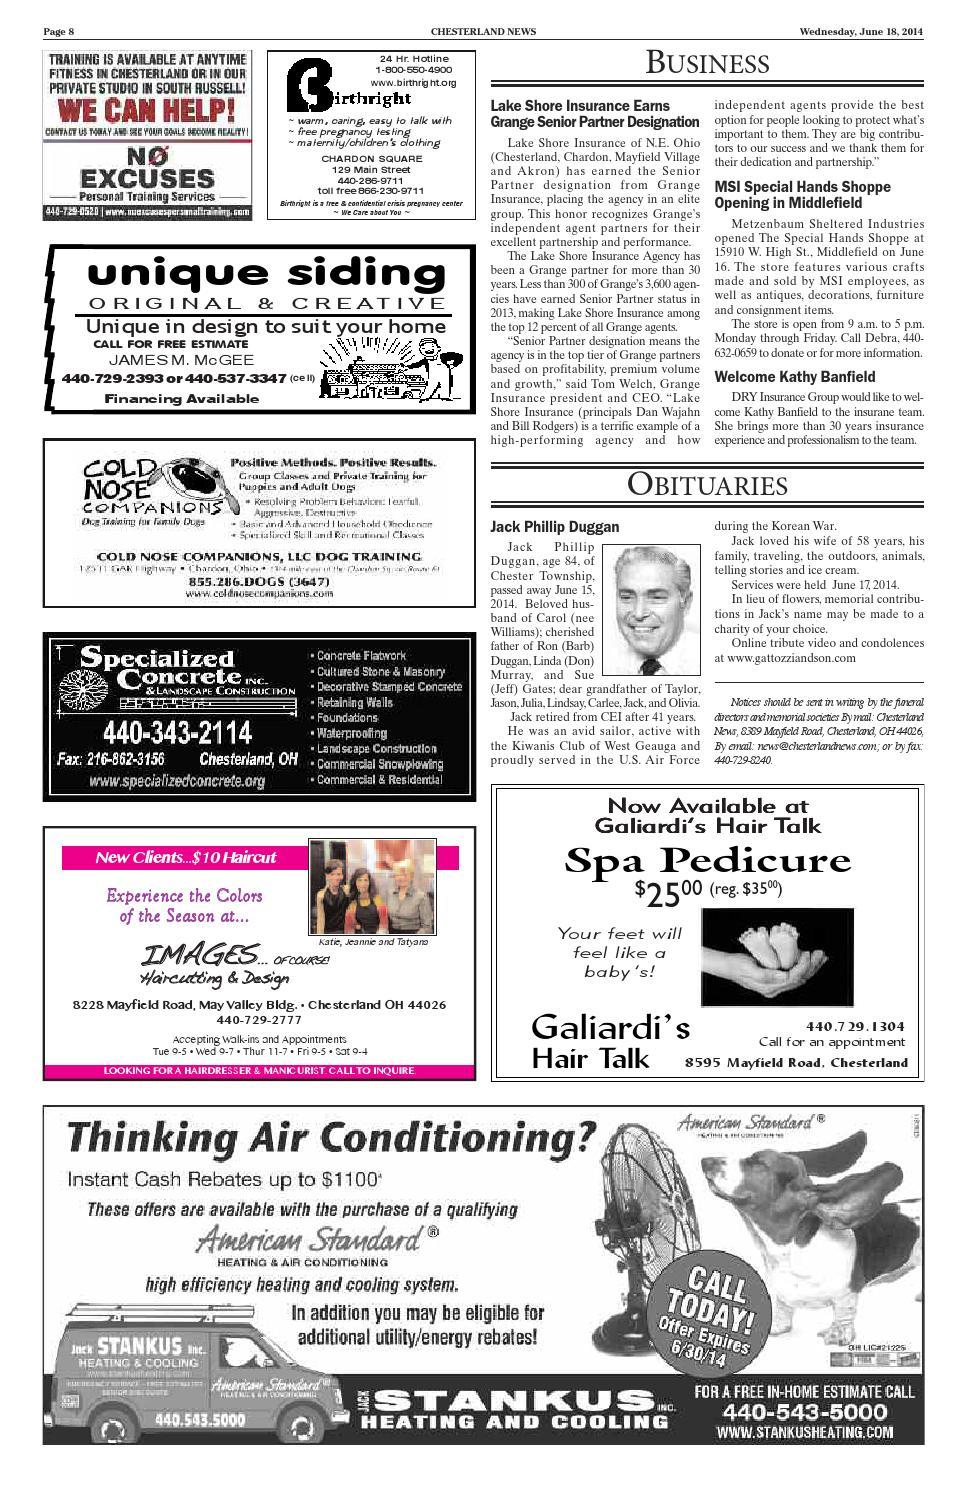 Chesterlandnews 6 18 14 By Chesterland News Issuu